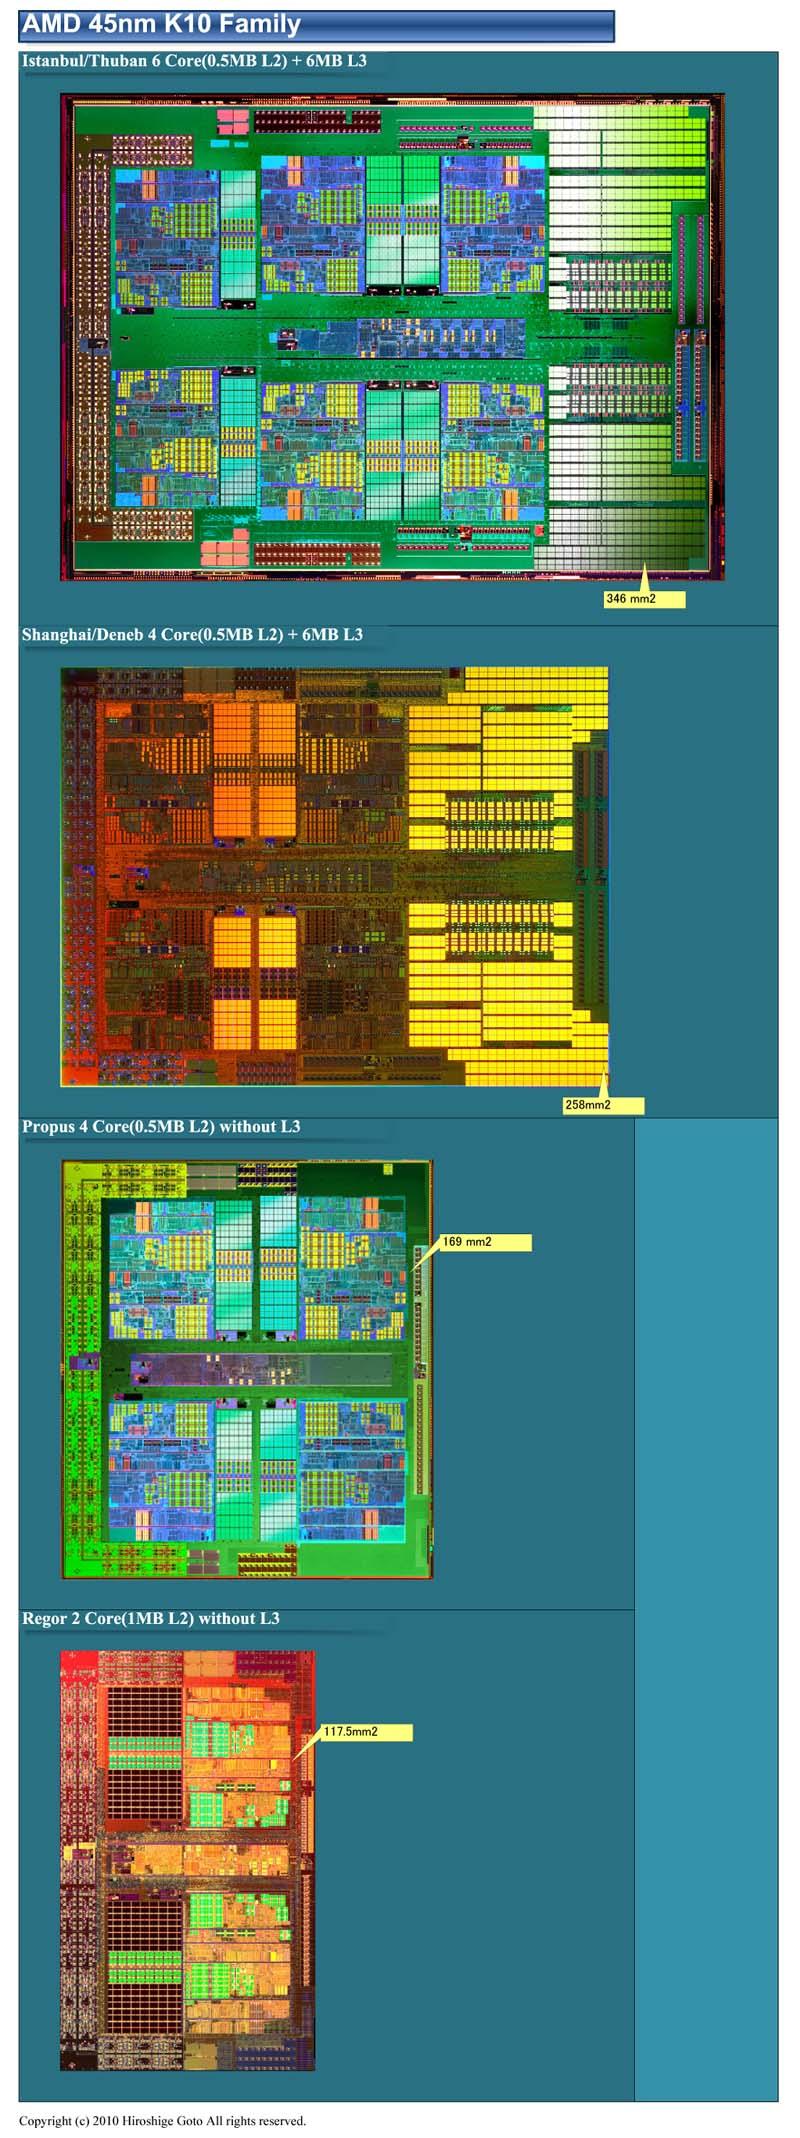 "AMDの45nm K10ファミリのダイサイズ<br>PDF版は<a ipw_linktype=""filelink_raw"" ipw_id=""679153"" href=""/video/pcw/docs/364/107/p01.pdf"">こちら</a>"